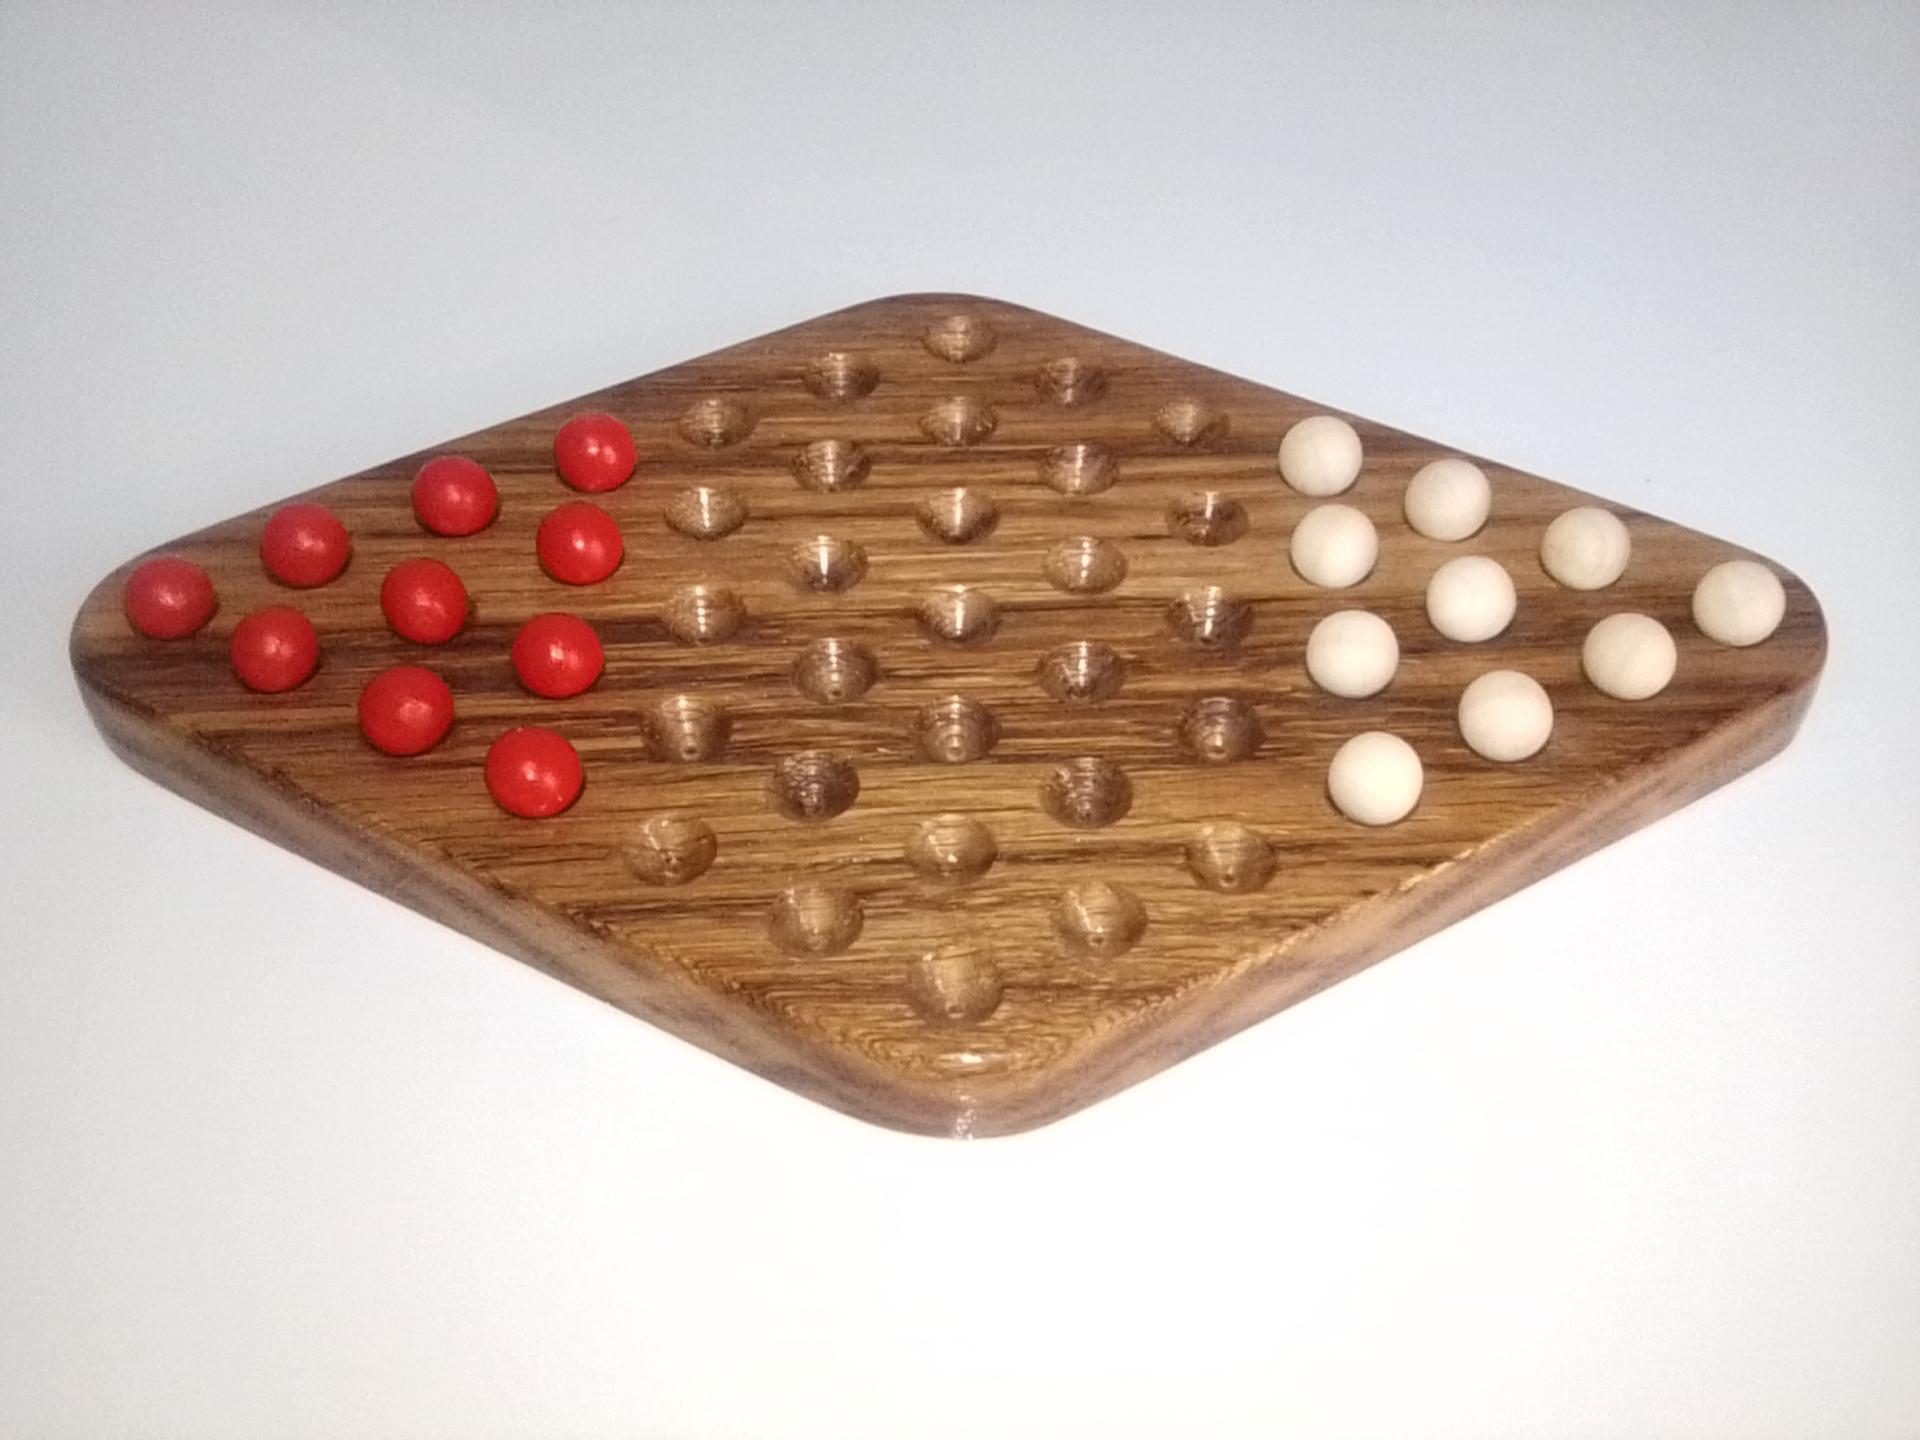 jeu dame chinoises 2 joueurs